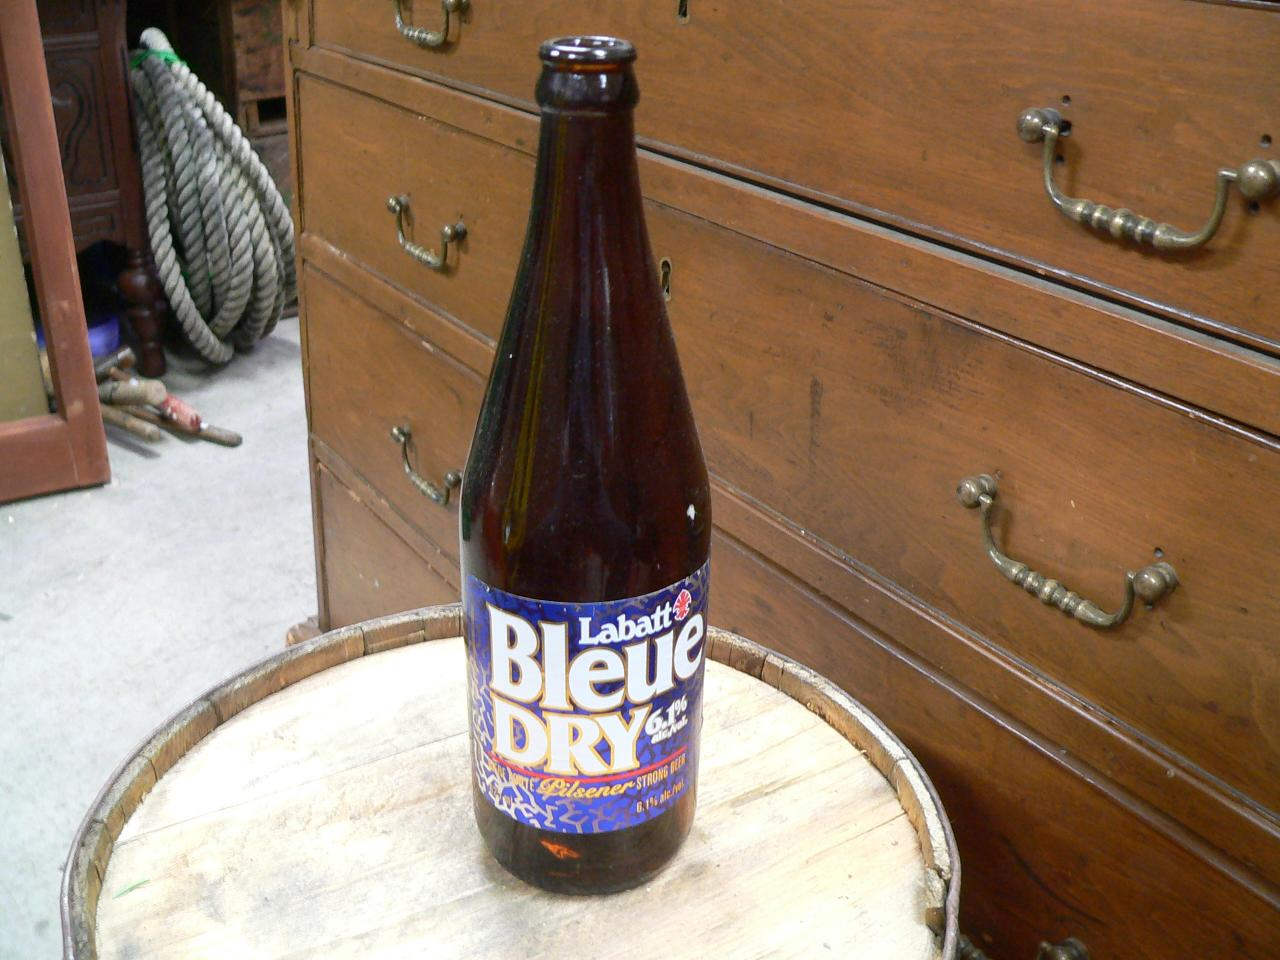 Grosse bouteille biere labatt bleu dry # 4705.4